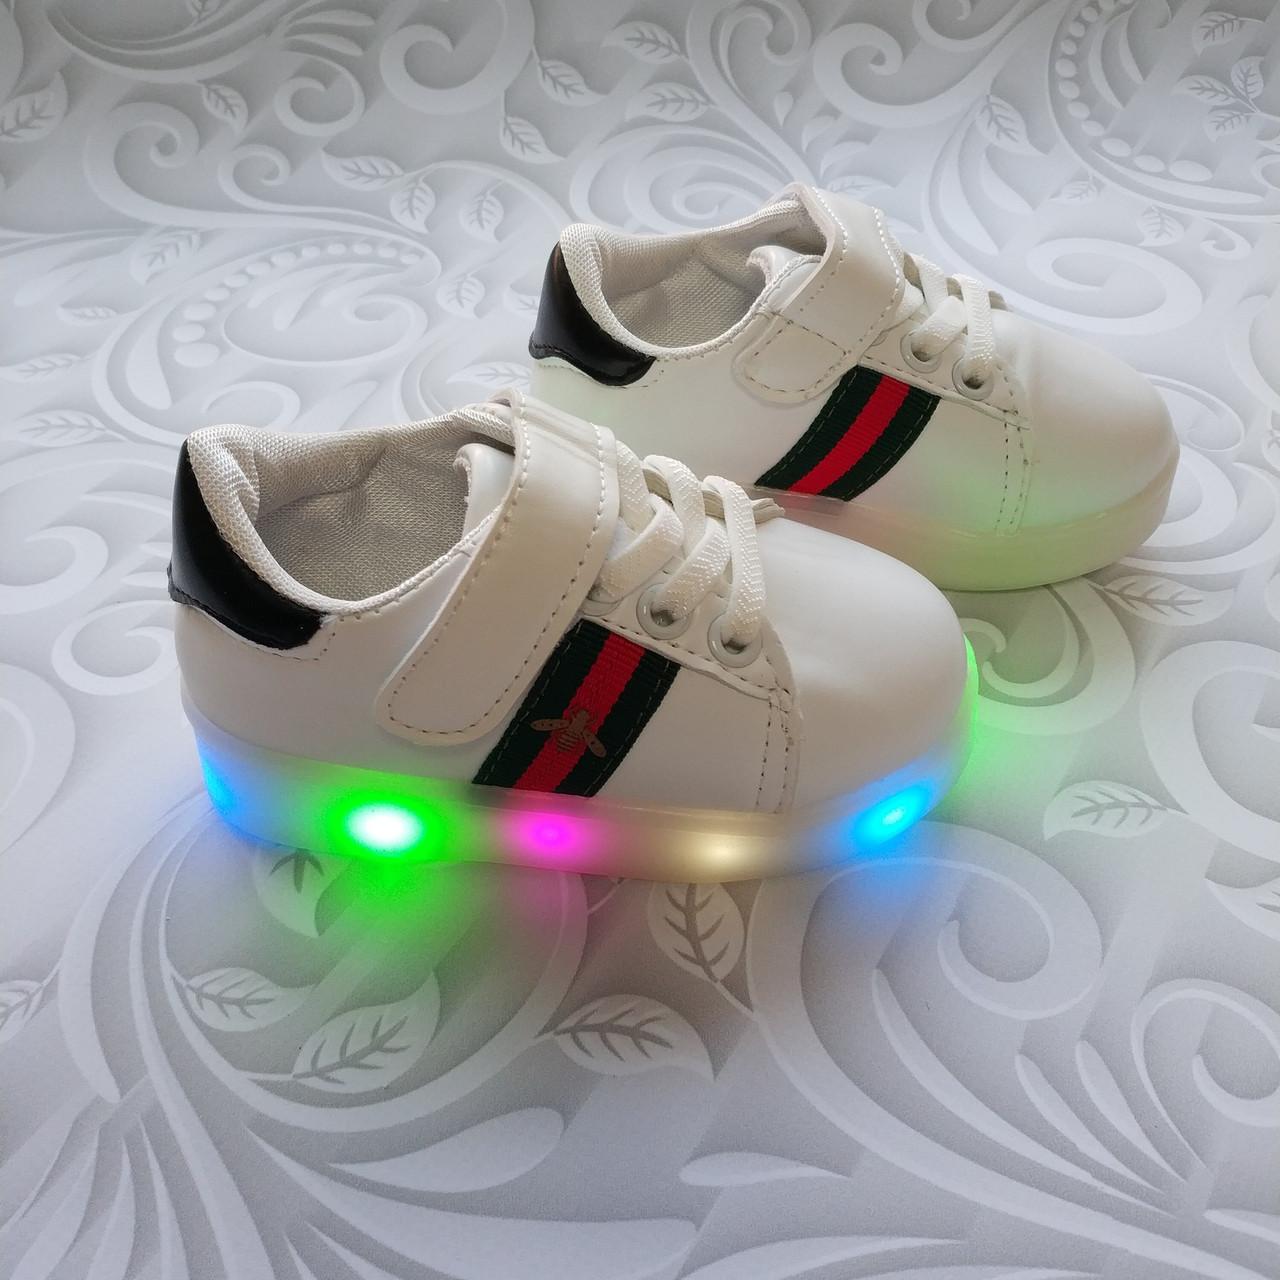 Детские кроссовки Gucci с led подсветкой